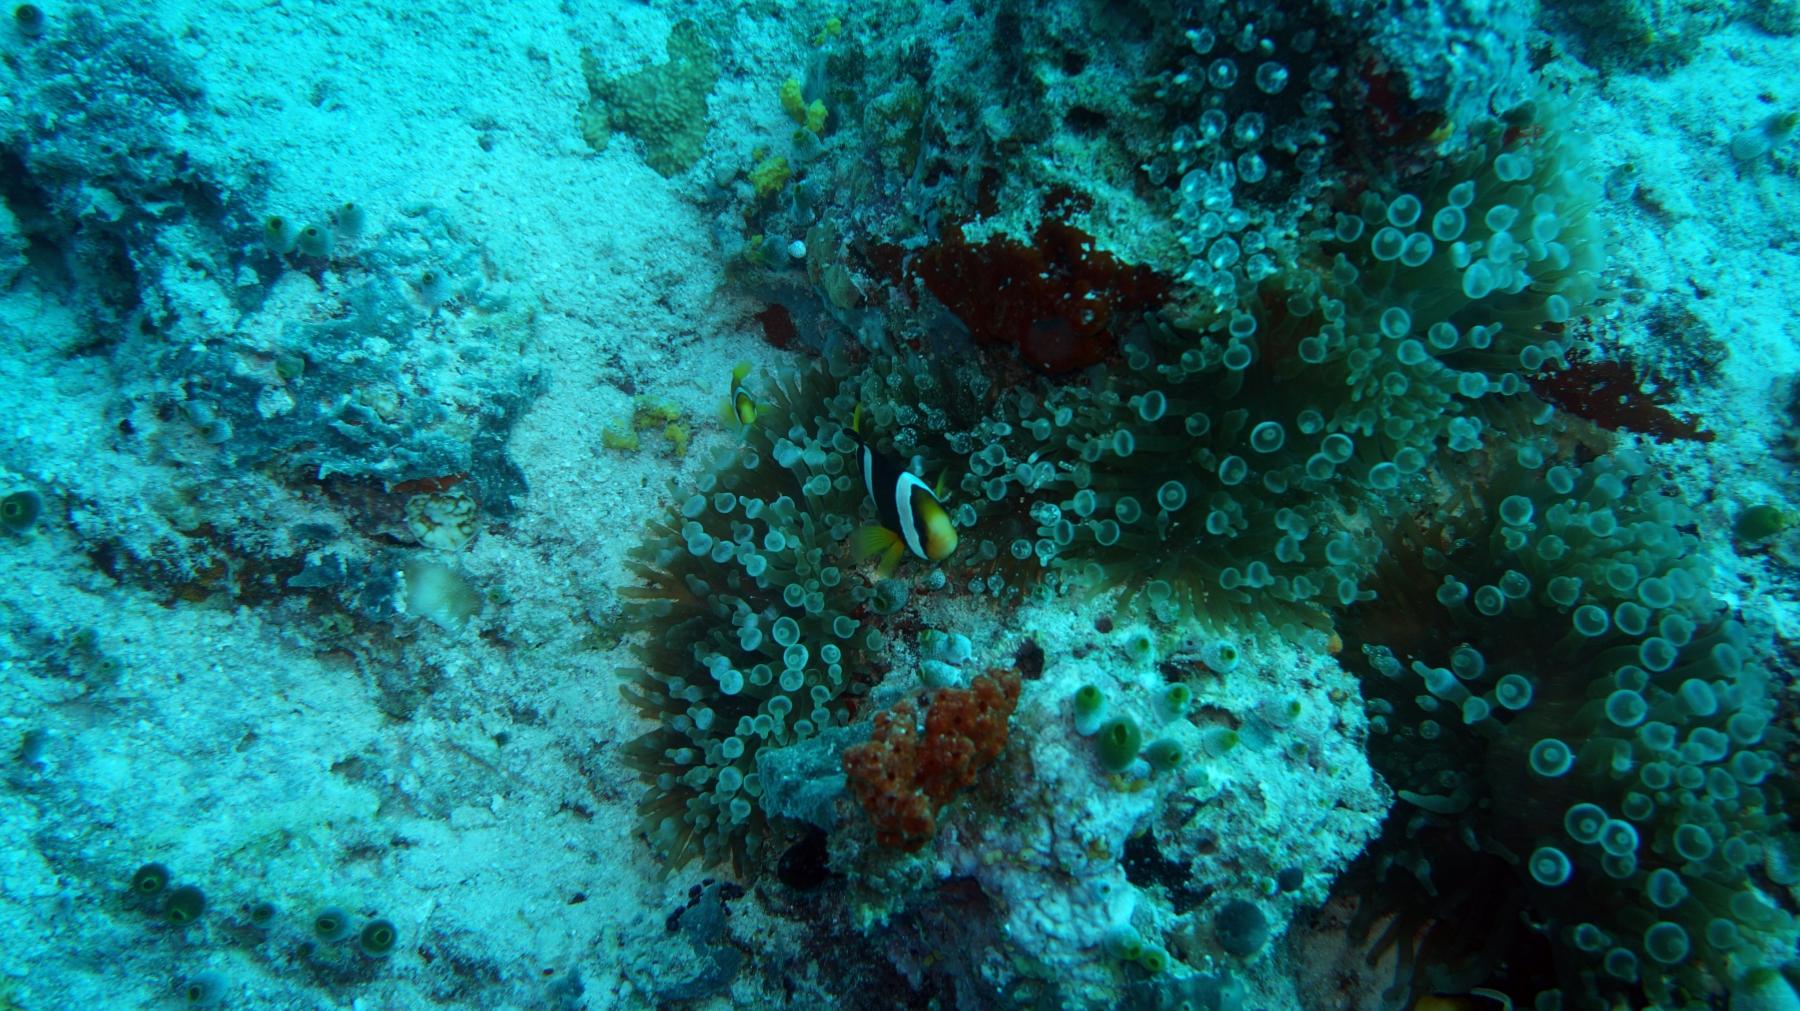 Amphiprion_clarkii_004_C_Damiselas-Peces-Payaso_L_Maldivas_U_Sebas_01072015